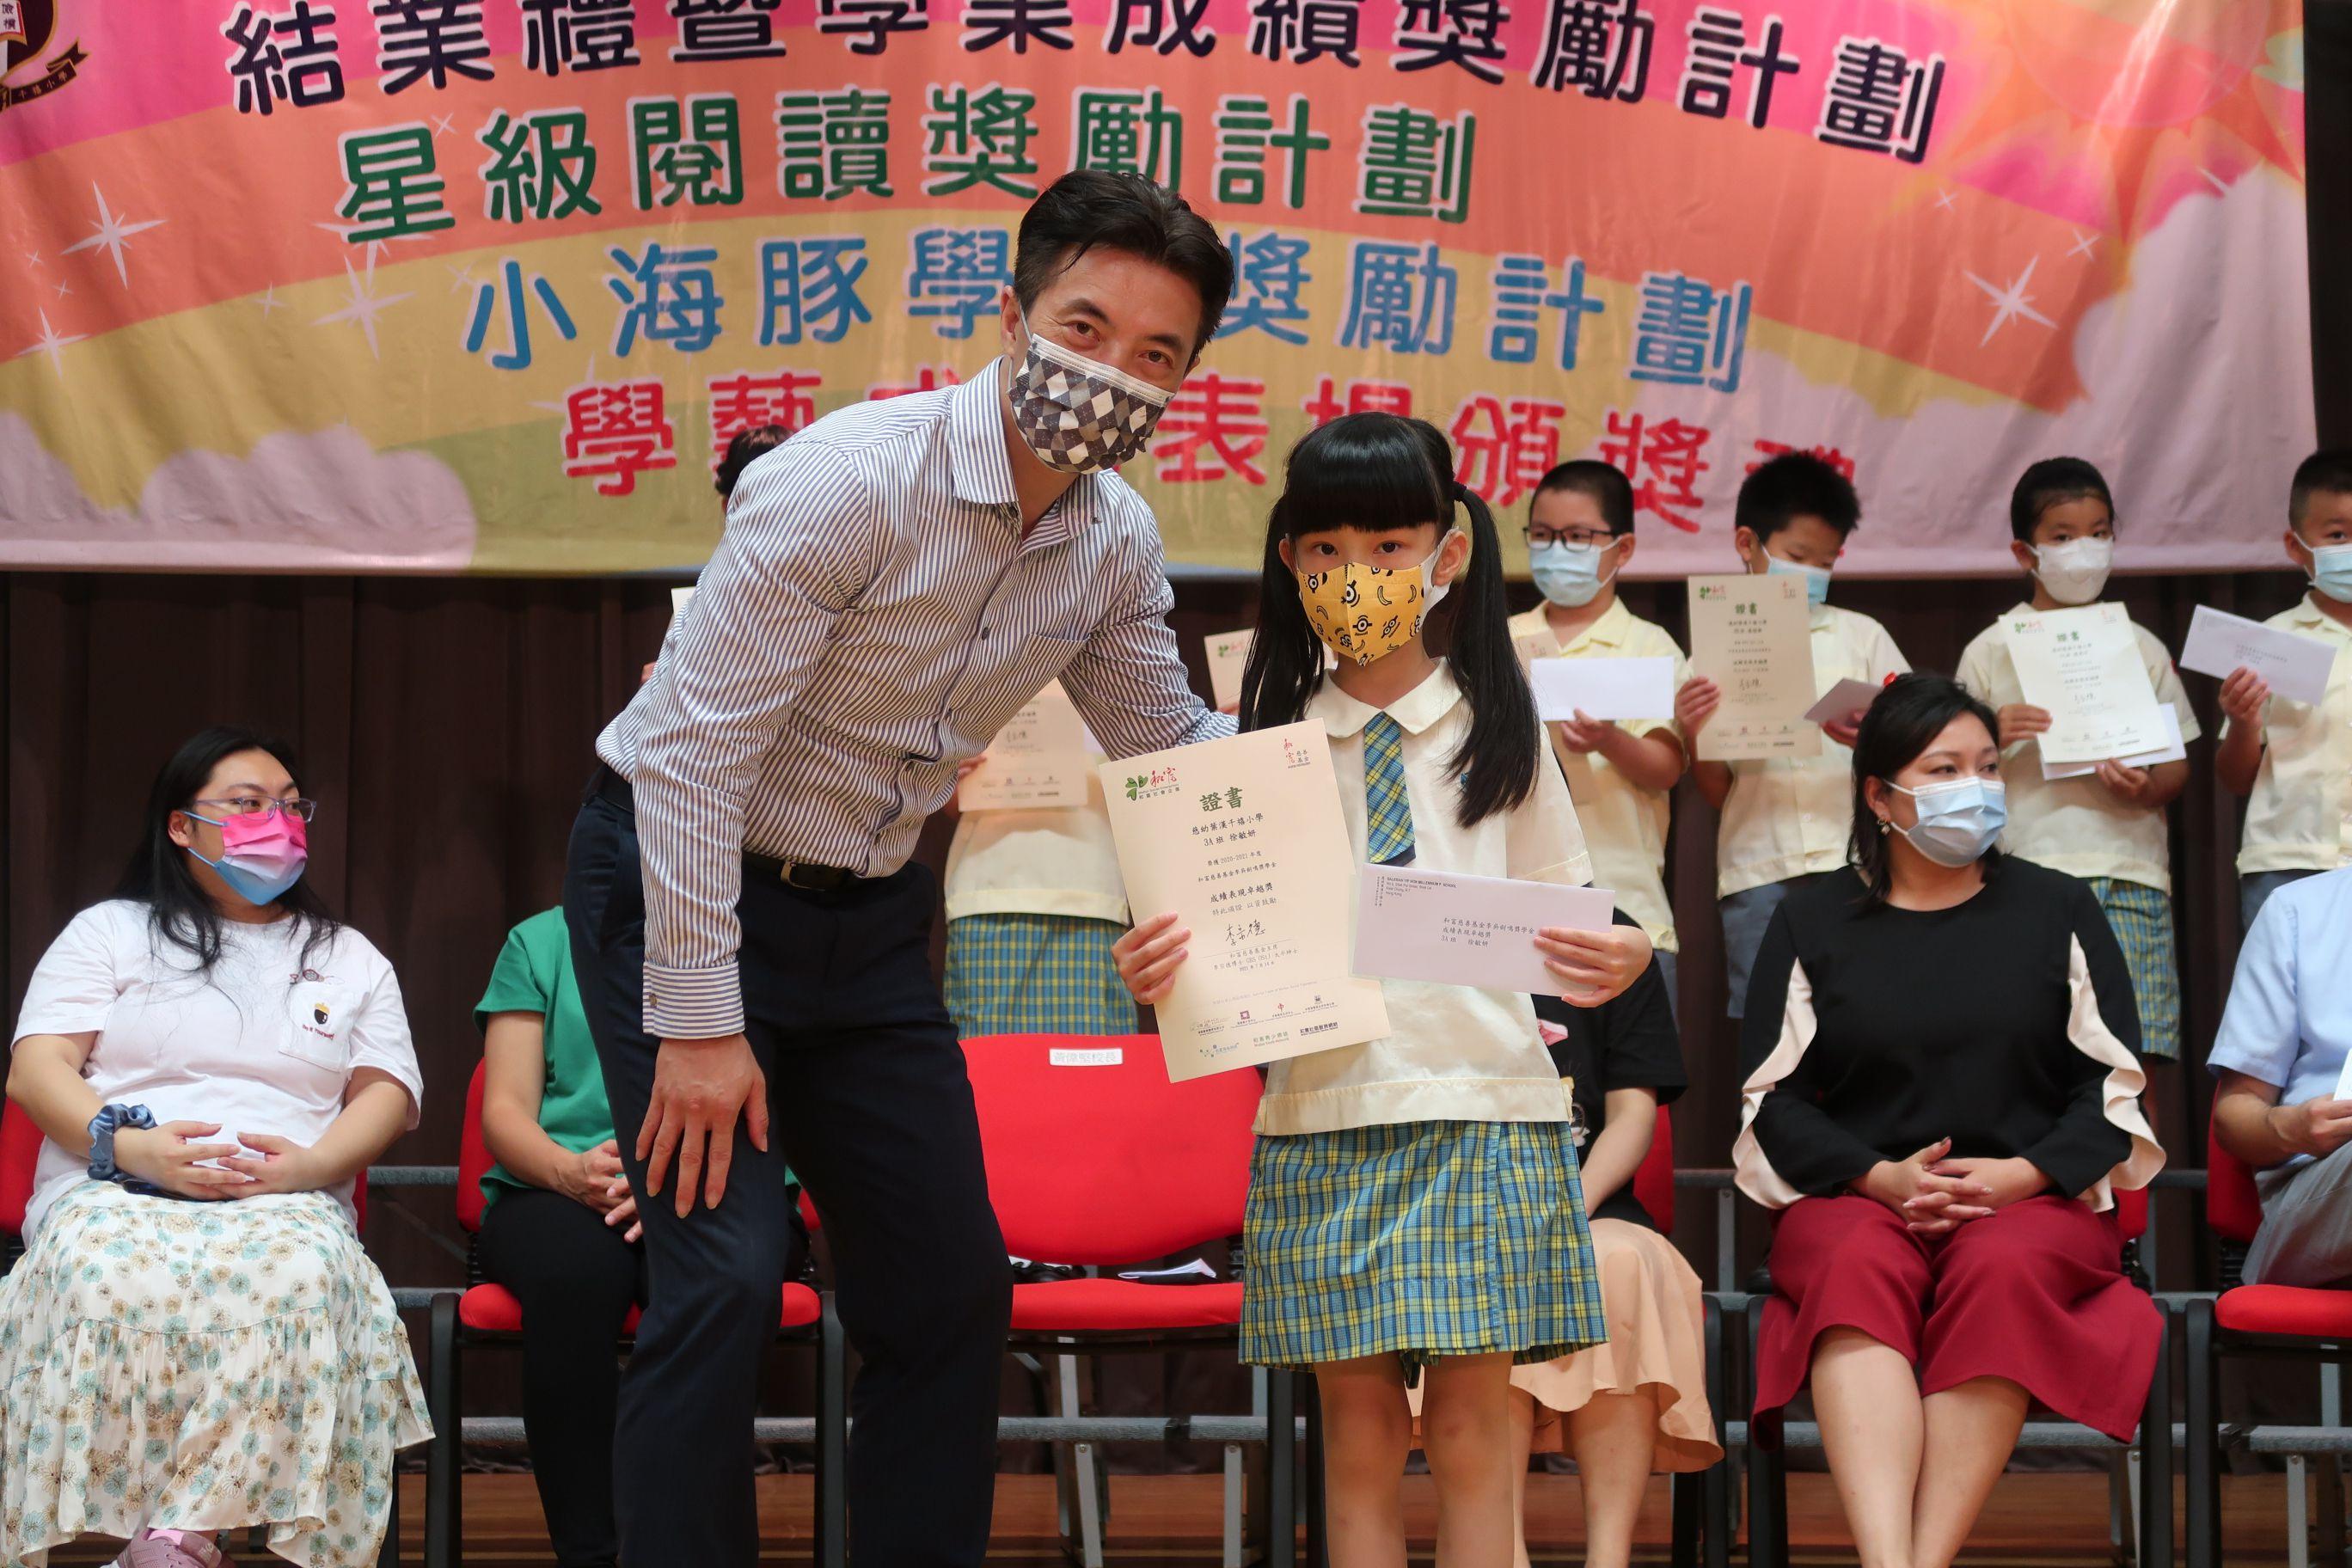 https://syh.edu.hk/sites/default/files/img_5935_1.jpg